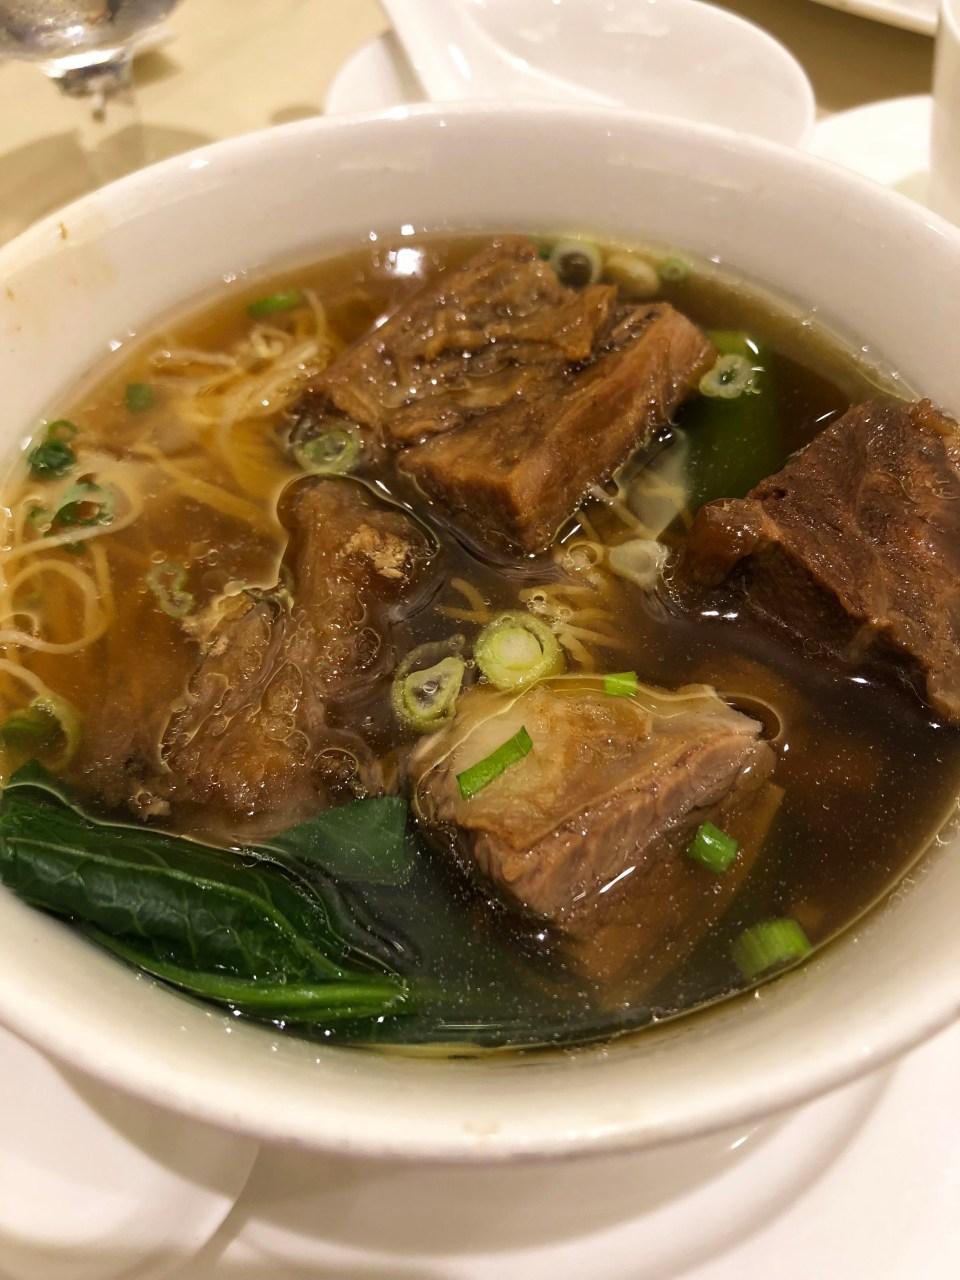 Yung Kee - Soup Noodle + Beef Brisket